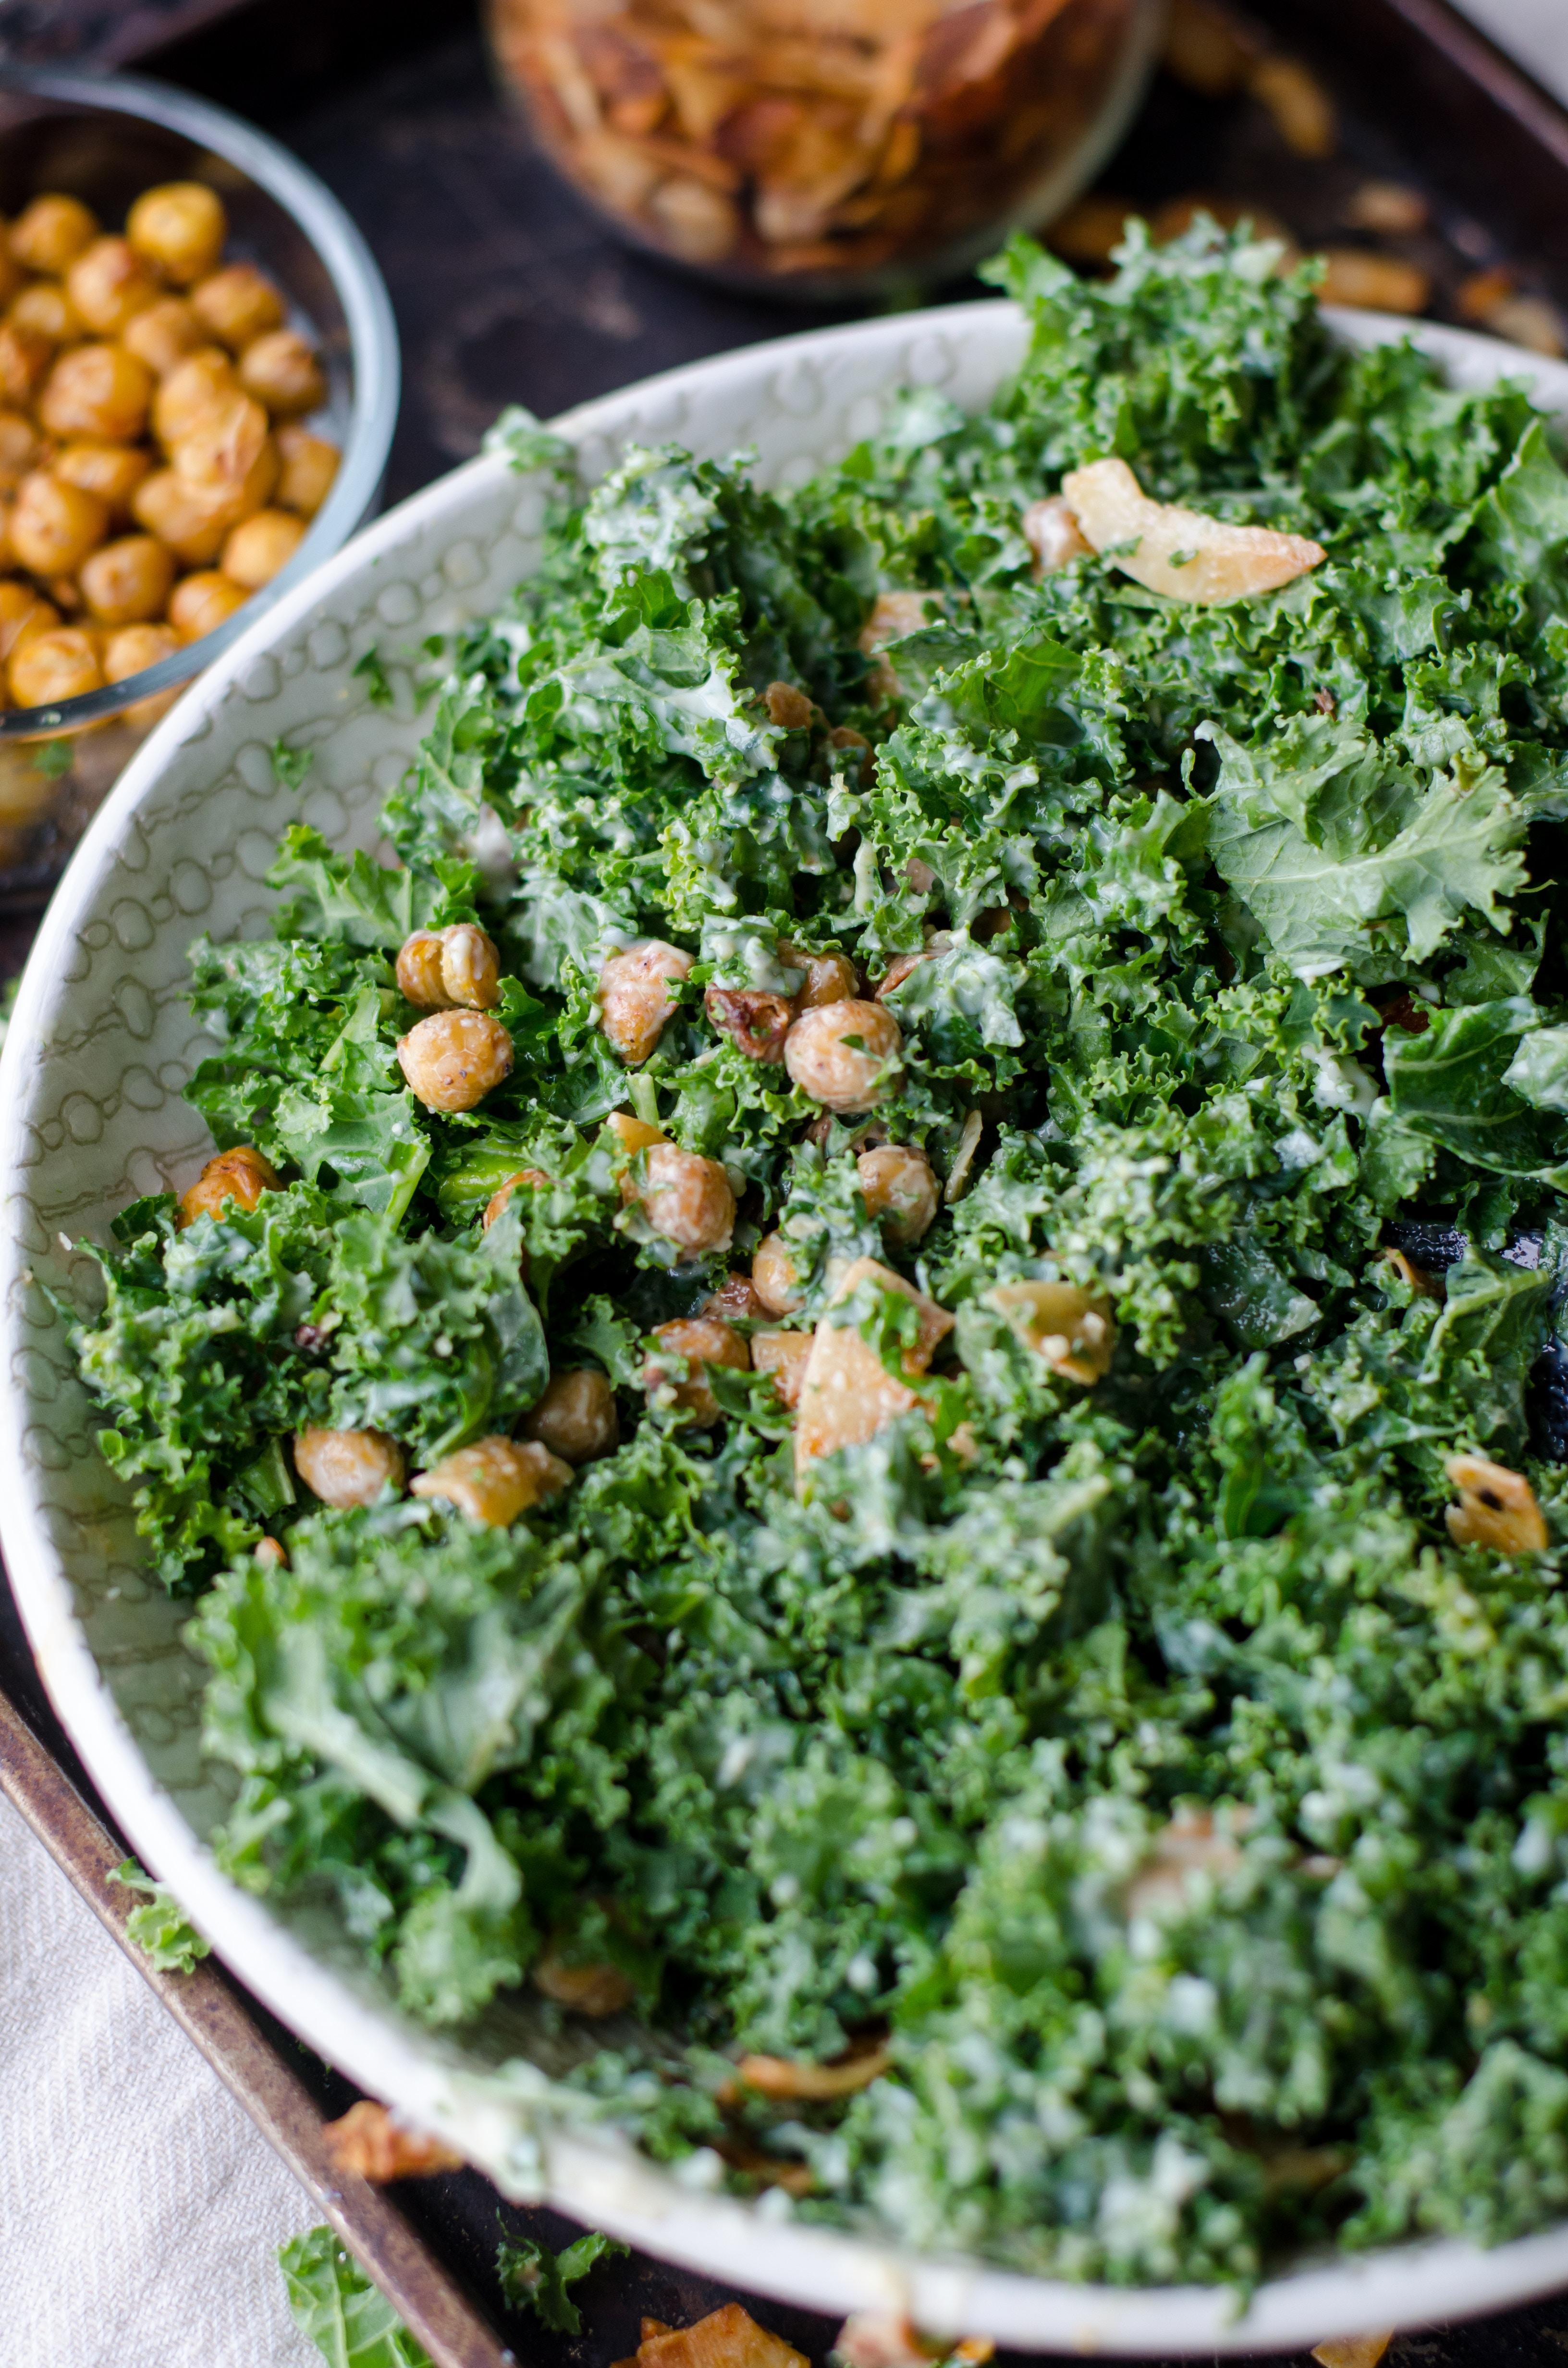 Kale and Chickpeas Salad